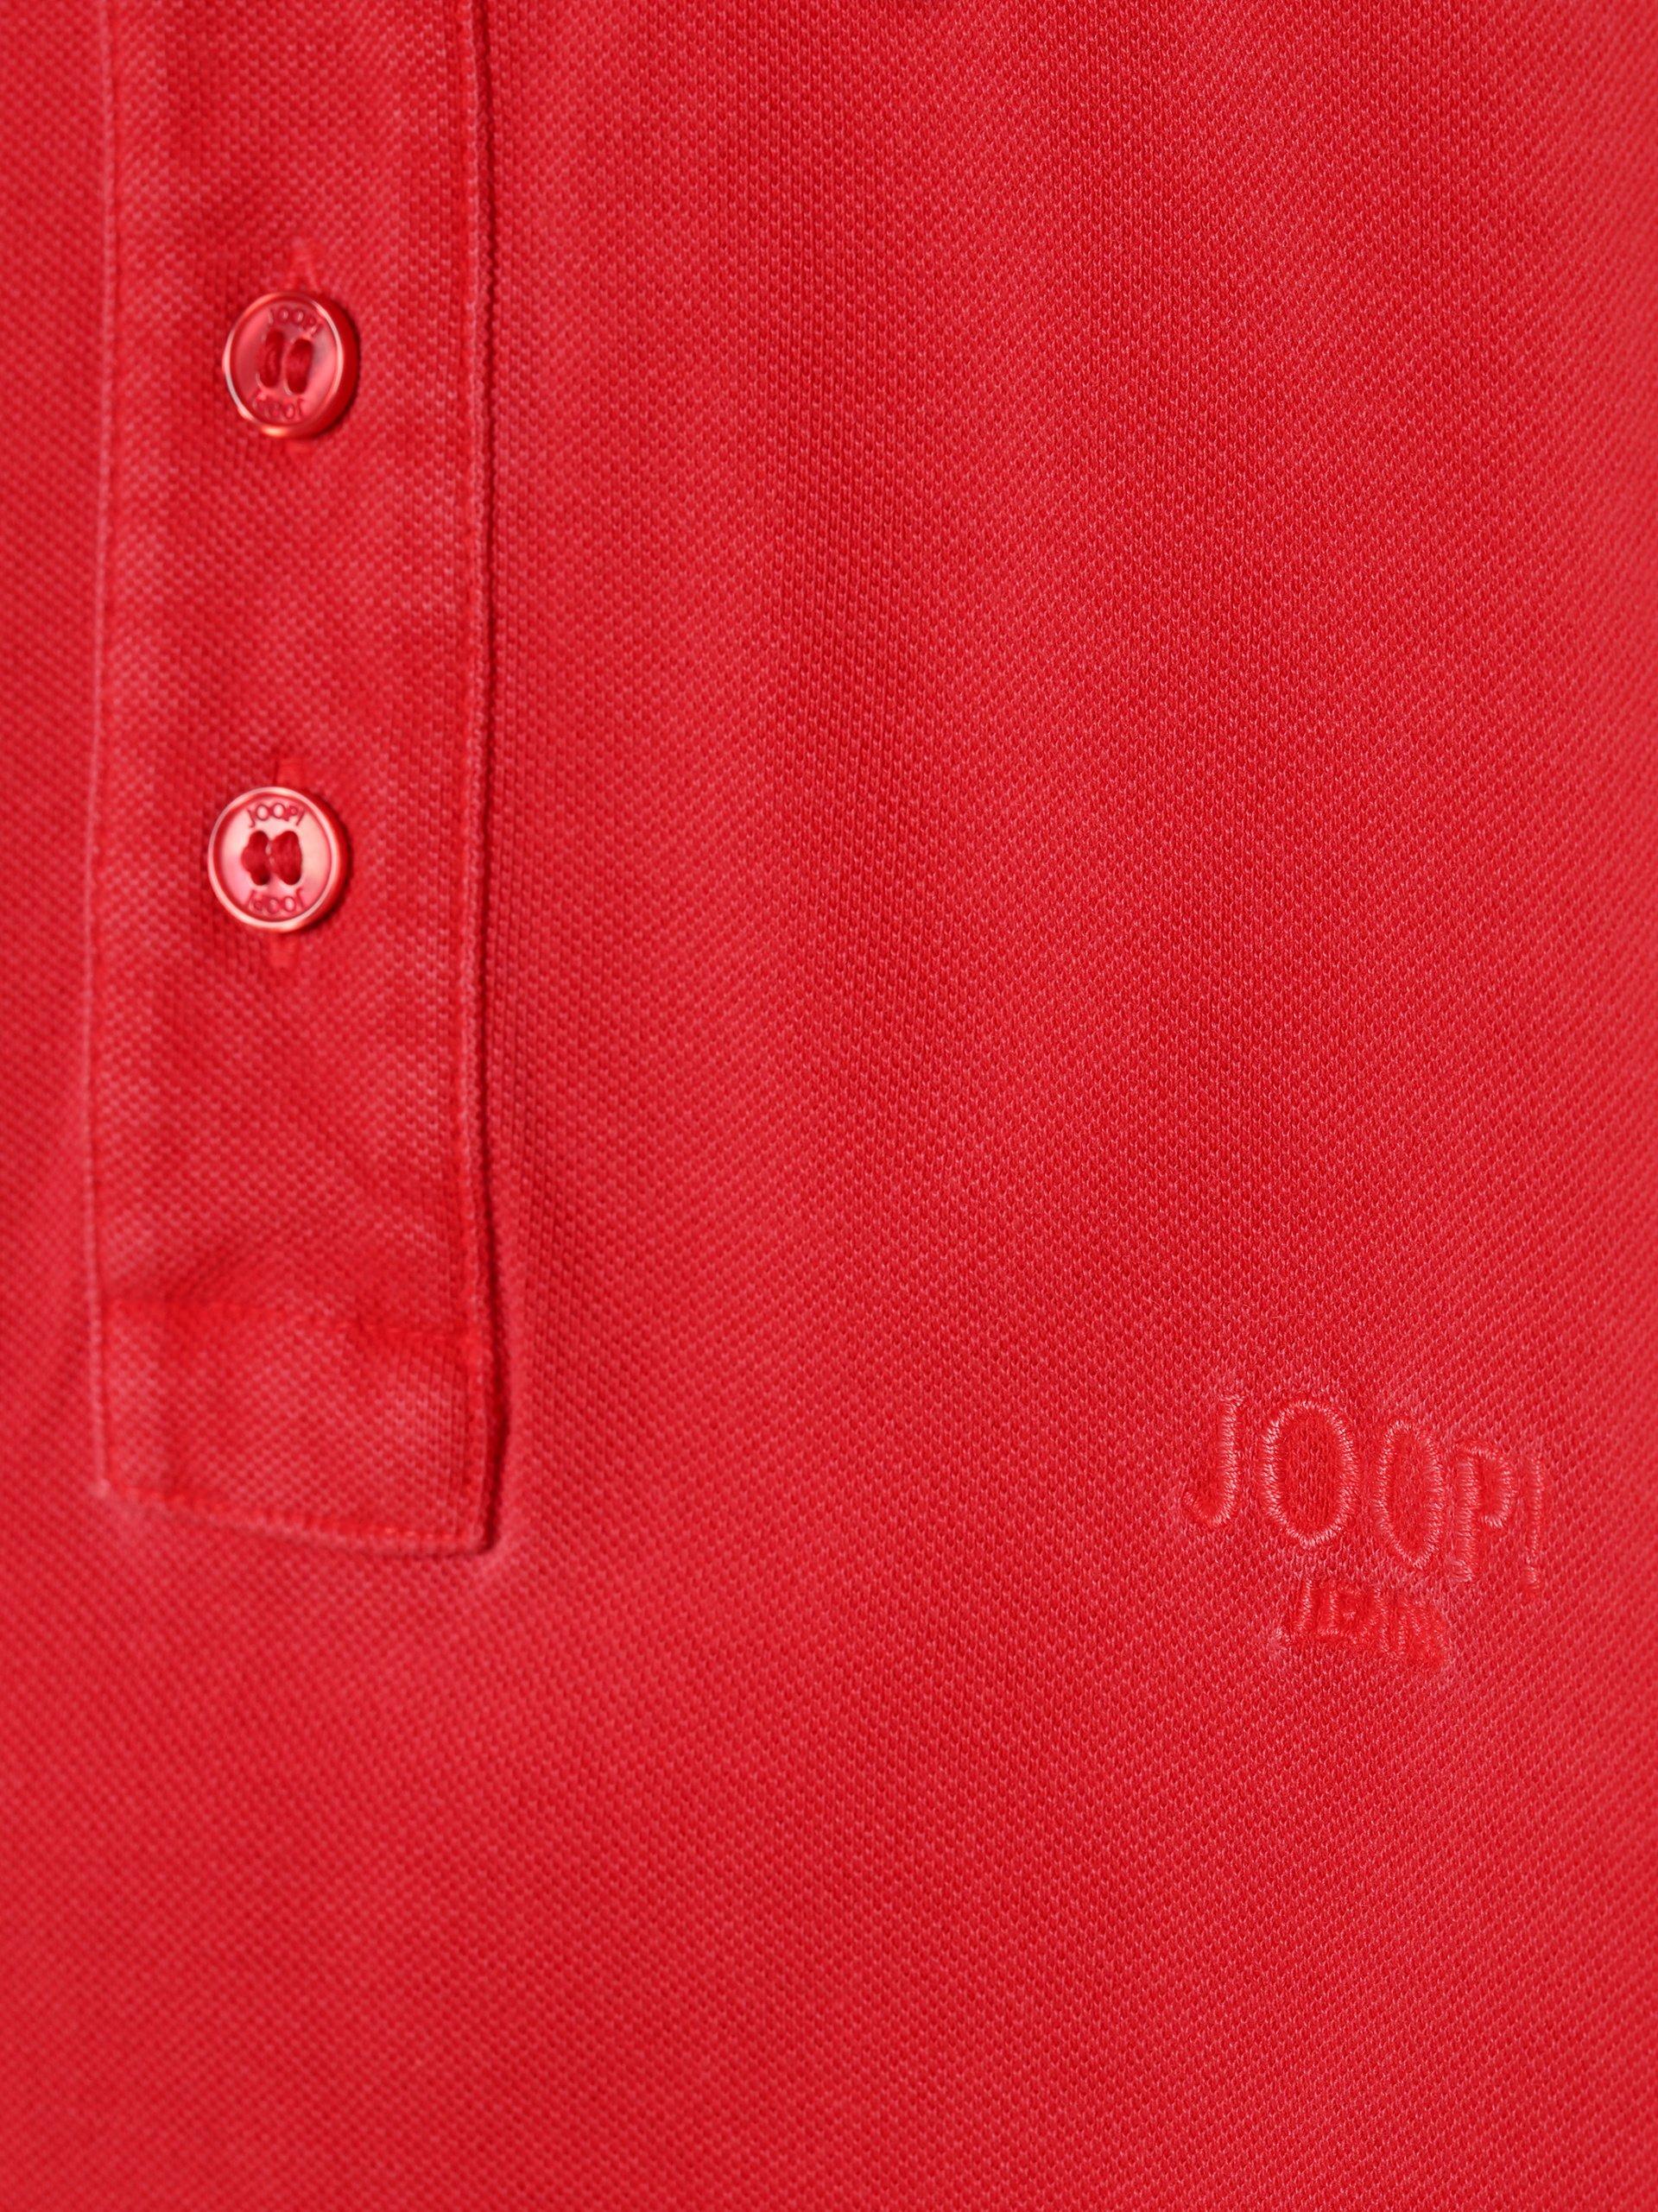 Joop Herren Poloshirt - Ambrosio